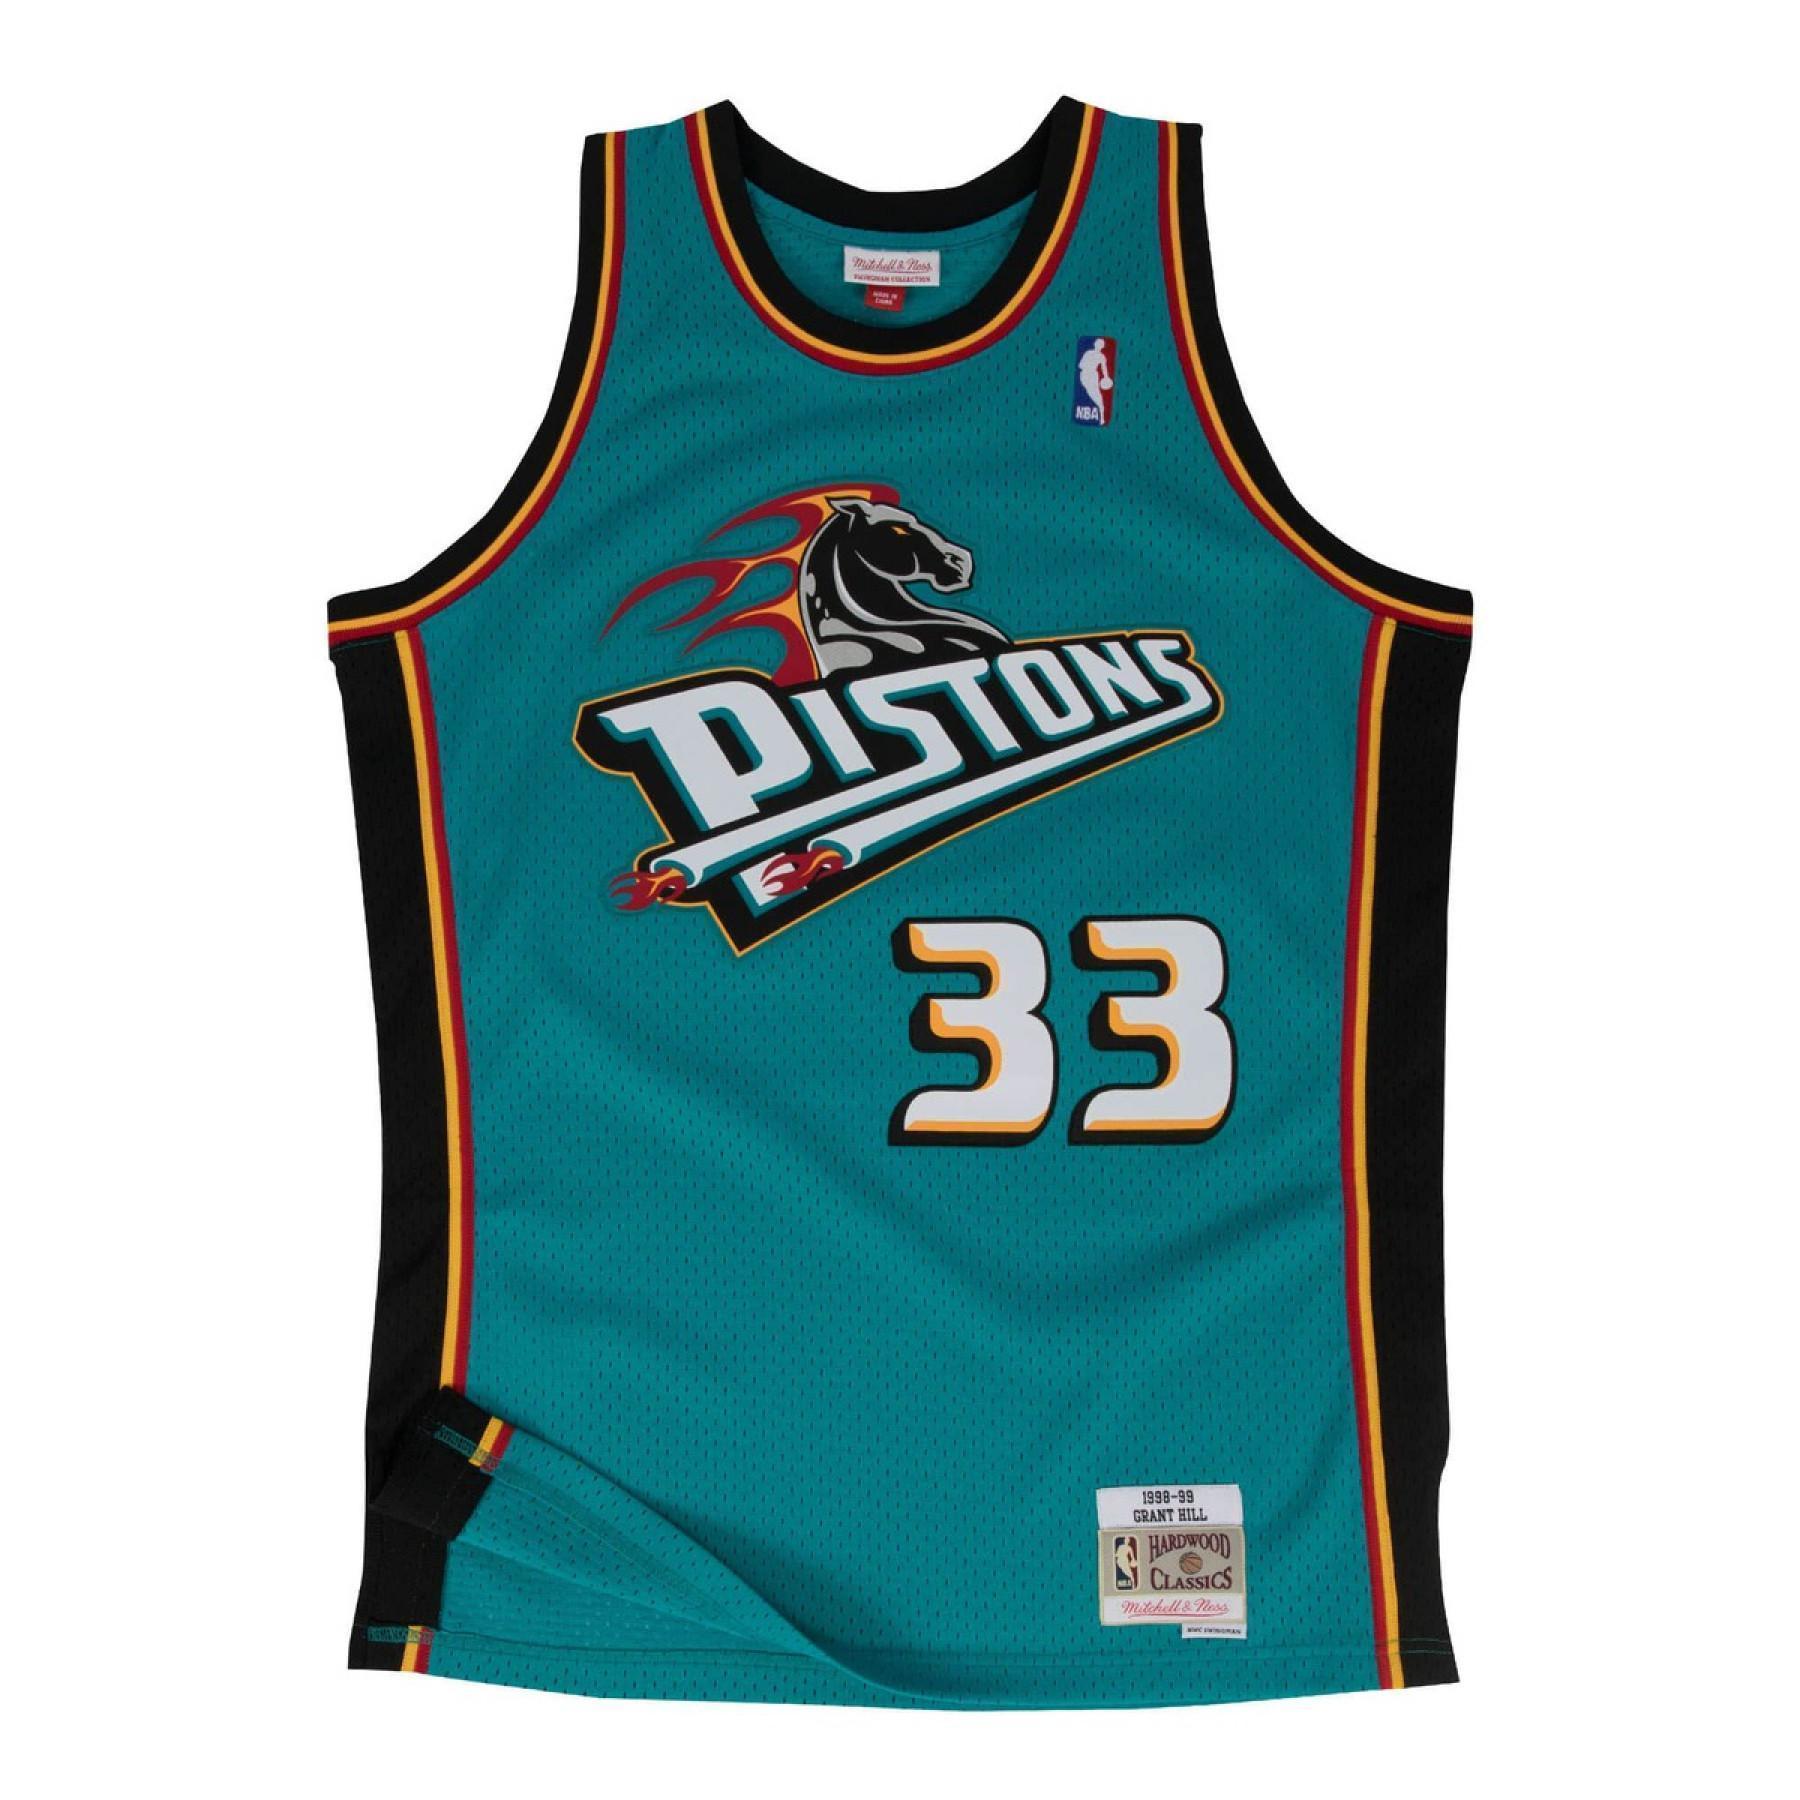 Detroit Pistons Grant Hill Jersey